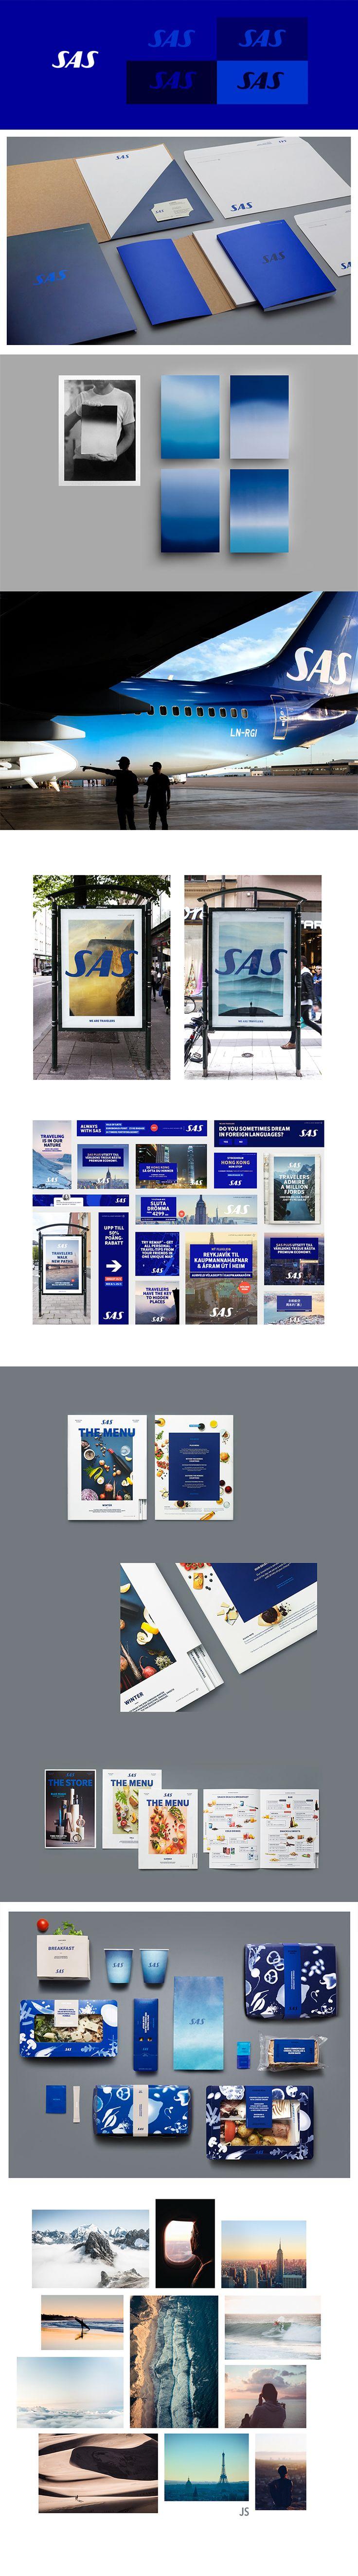 SAS Scandinavian Airlines 'True Travelers' Brand Redesign by Bold #branding #design #amazing